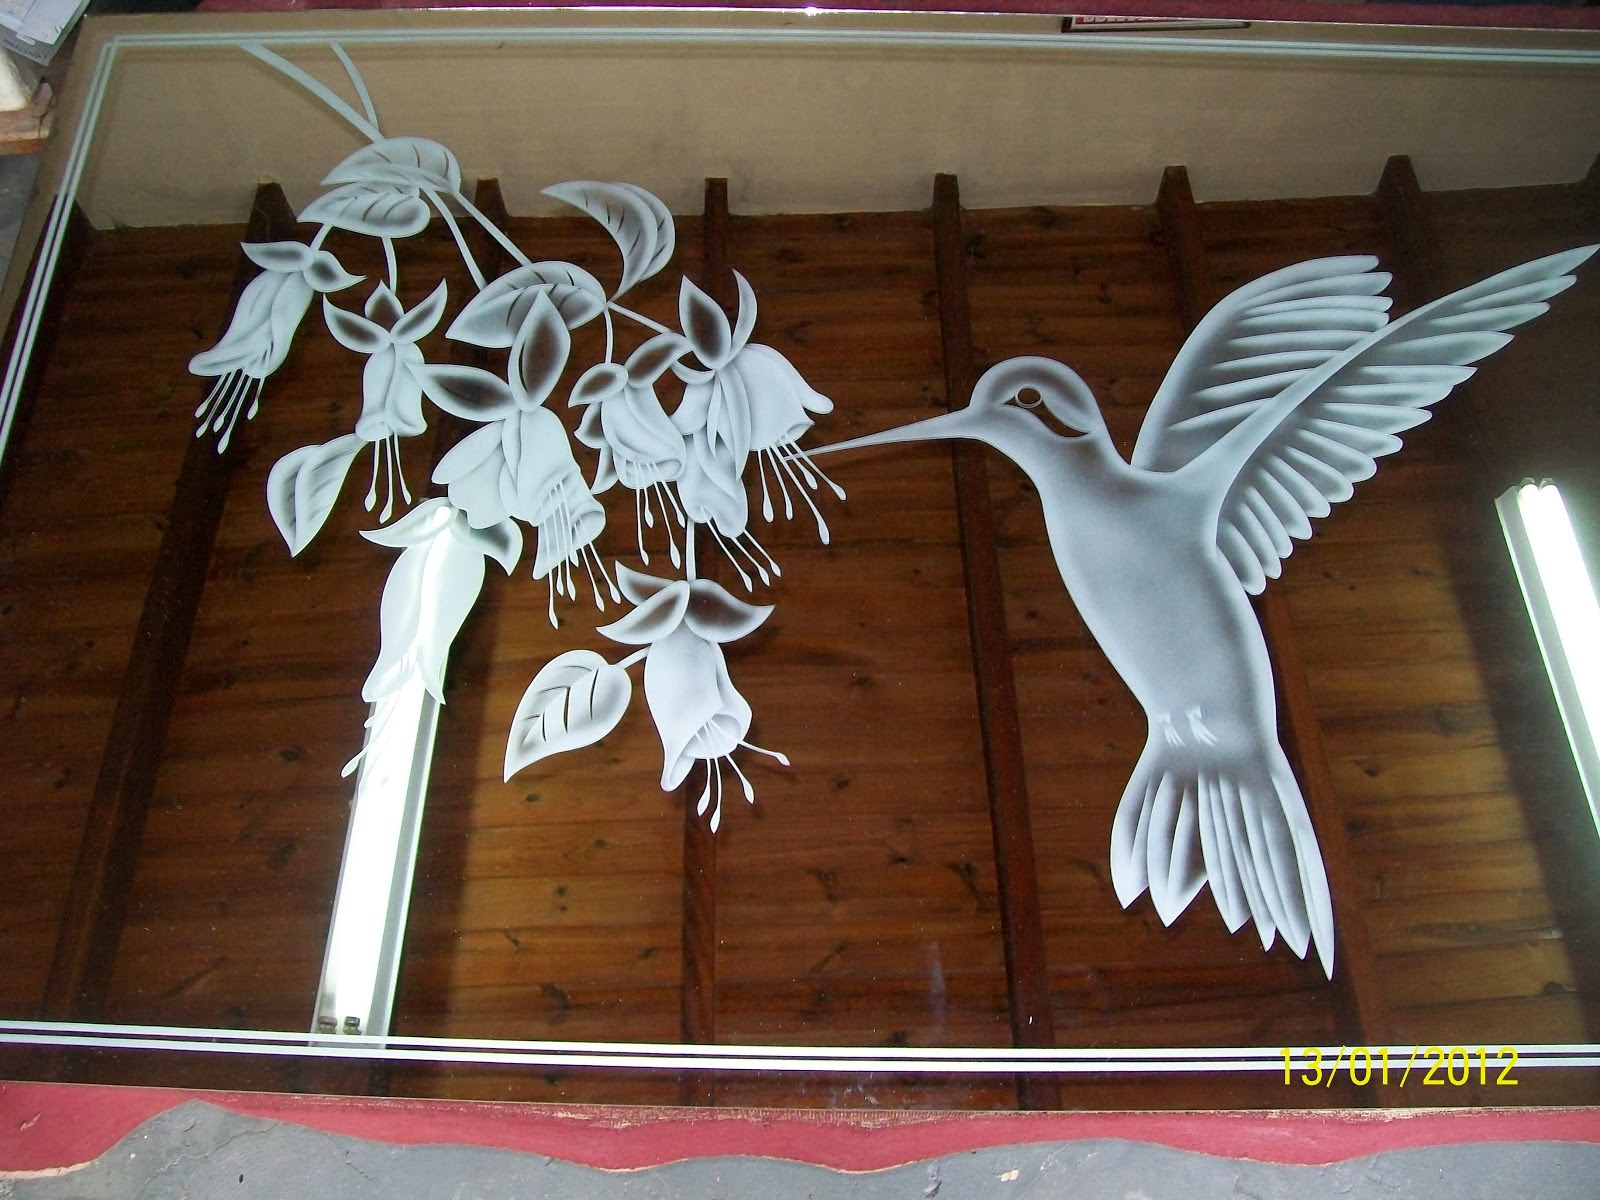 Imagens de #3B2314 Jato Artes MS 1600x1200 px 3164 Box Banheiro Acrilico Campo Grande Ms